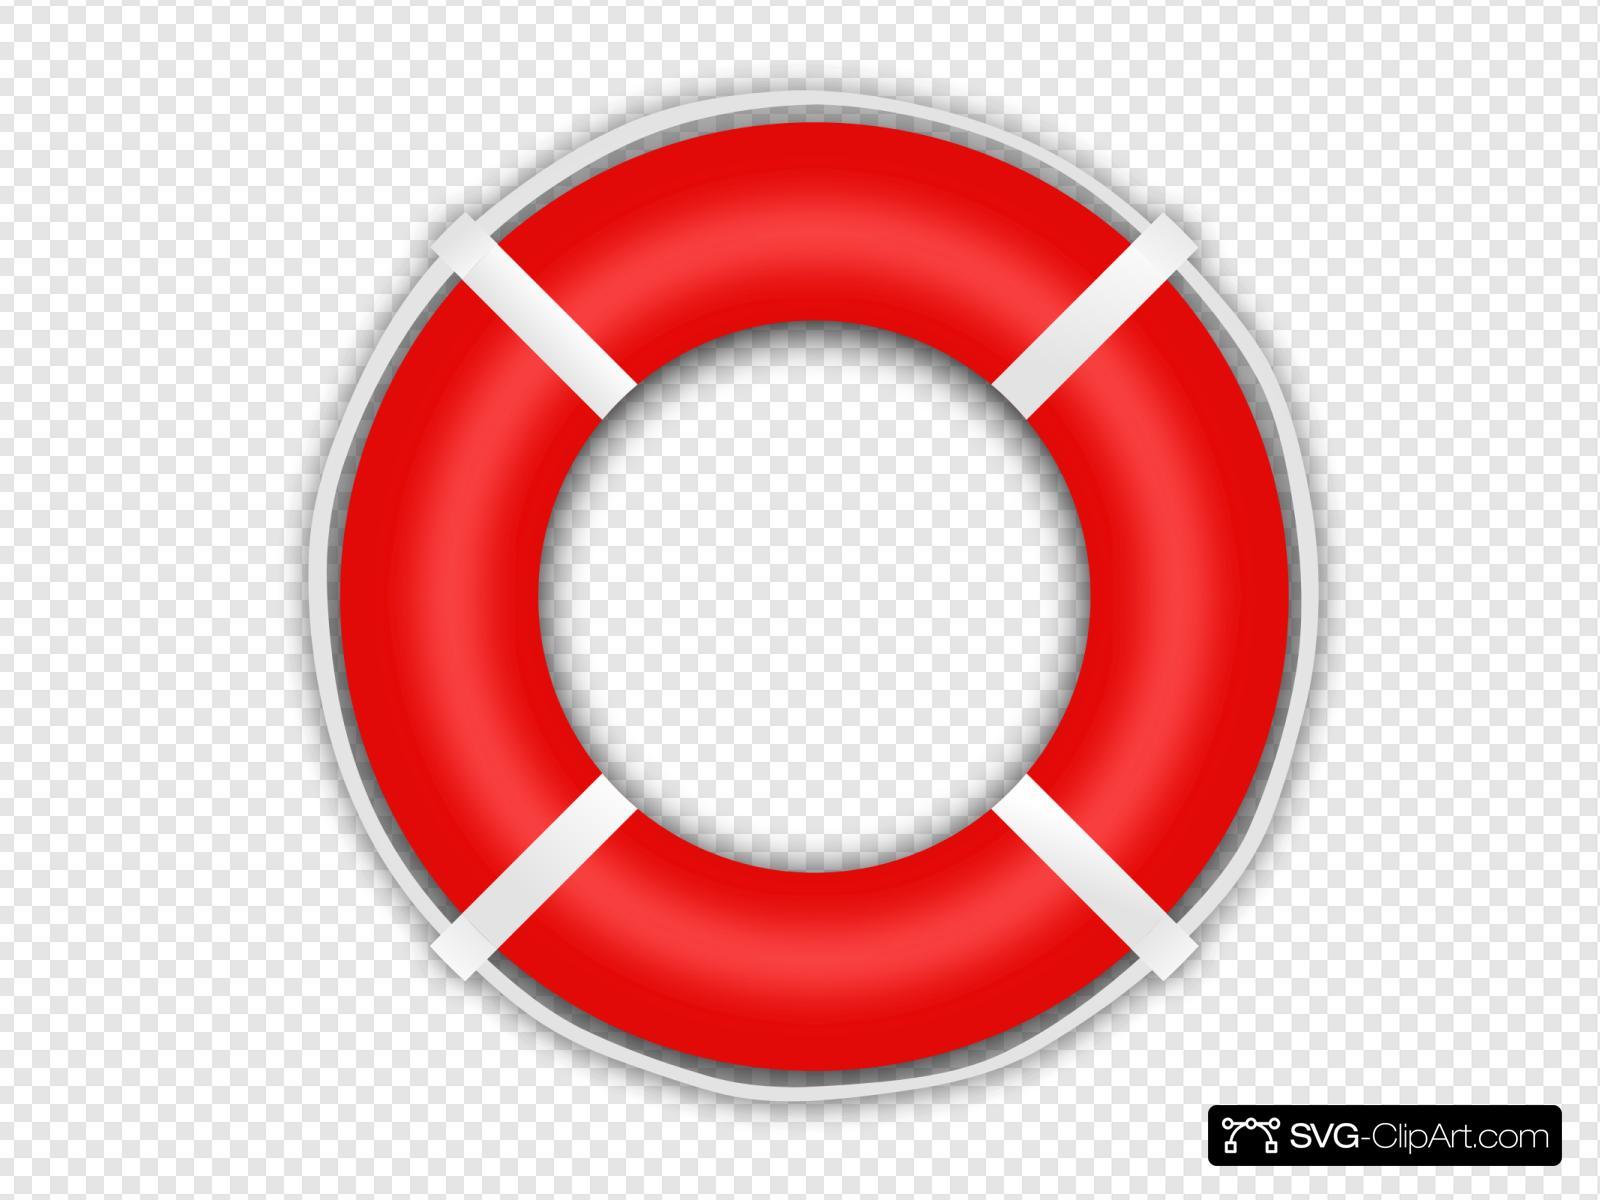 Lifesaver Clip art, Icon and SVG.